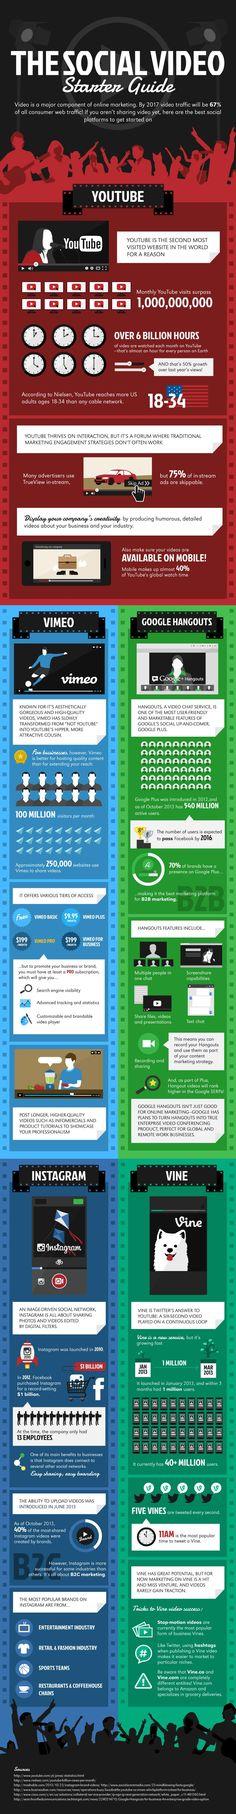 The Social Video Starter Guide - #SocialMedia #SocialNetworks #Infographic